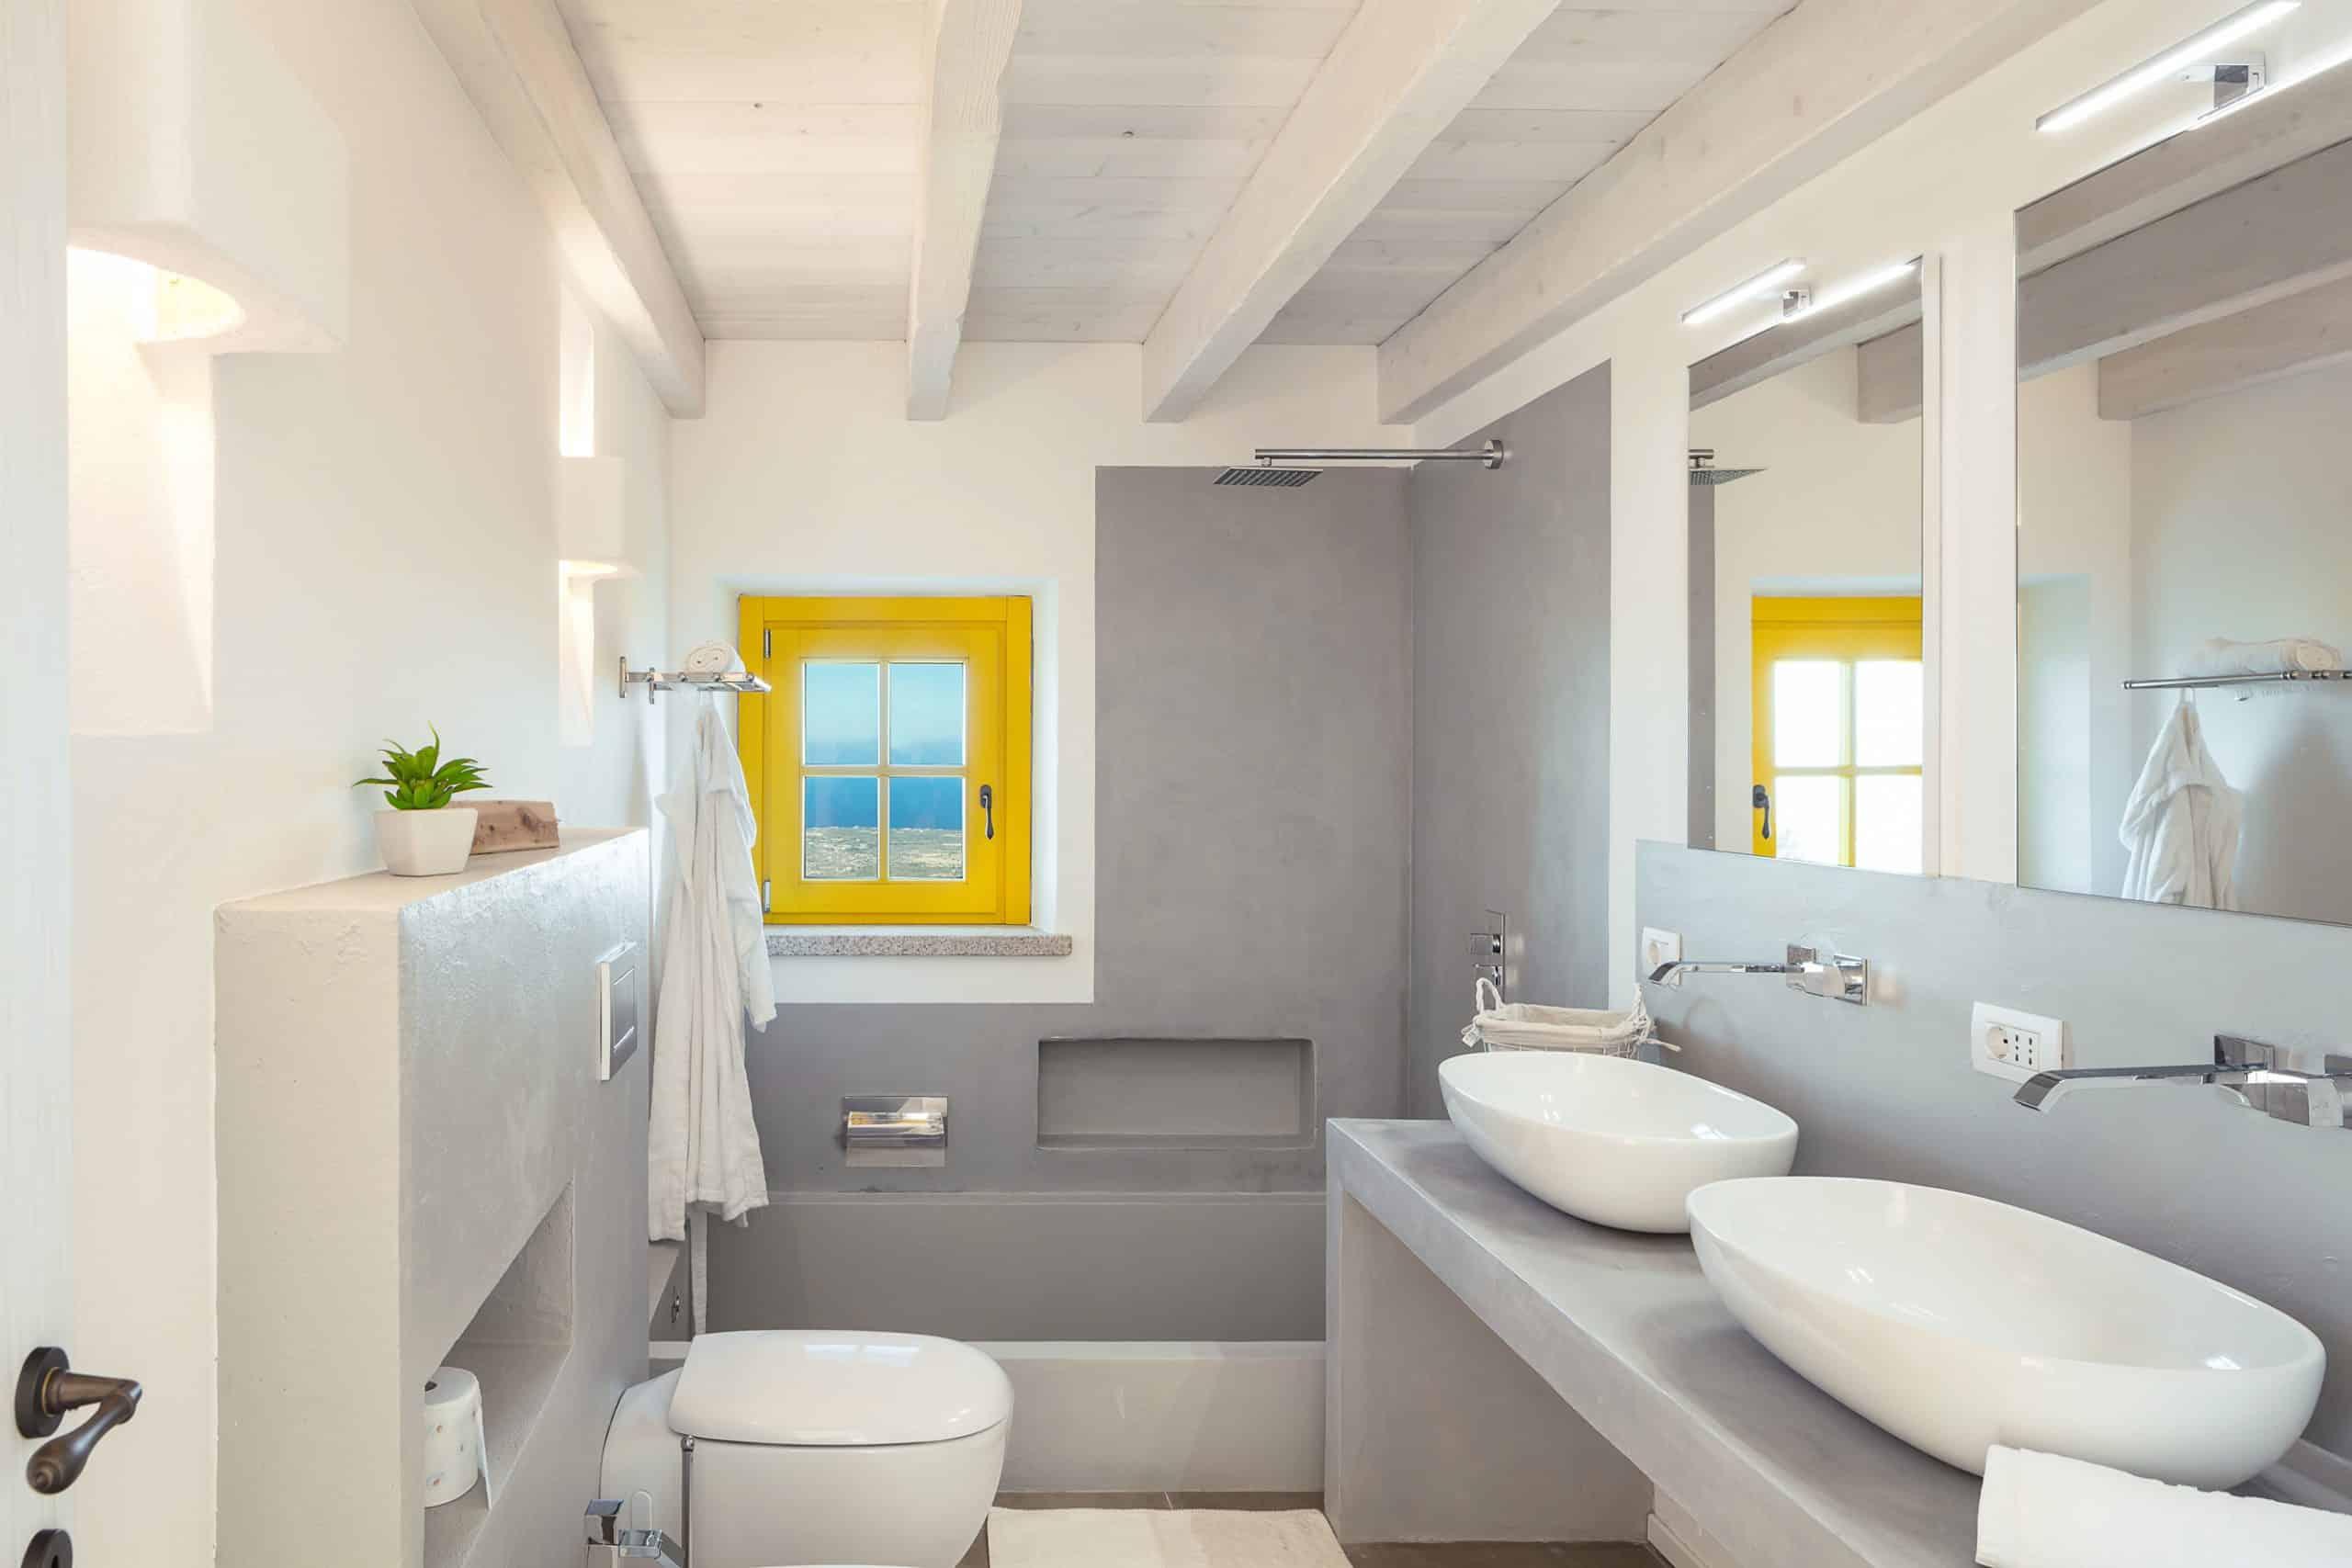 Wonderful Stazzo Style Villa With Pool For Rent In Aglientu ref Incantu